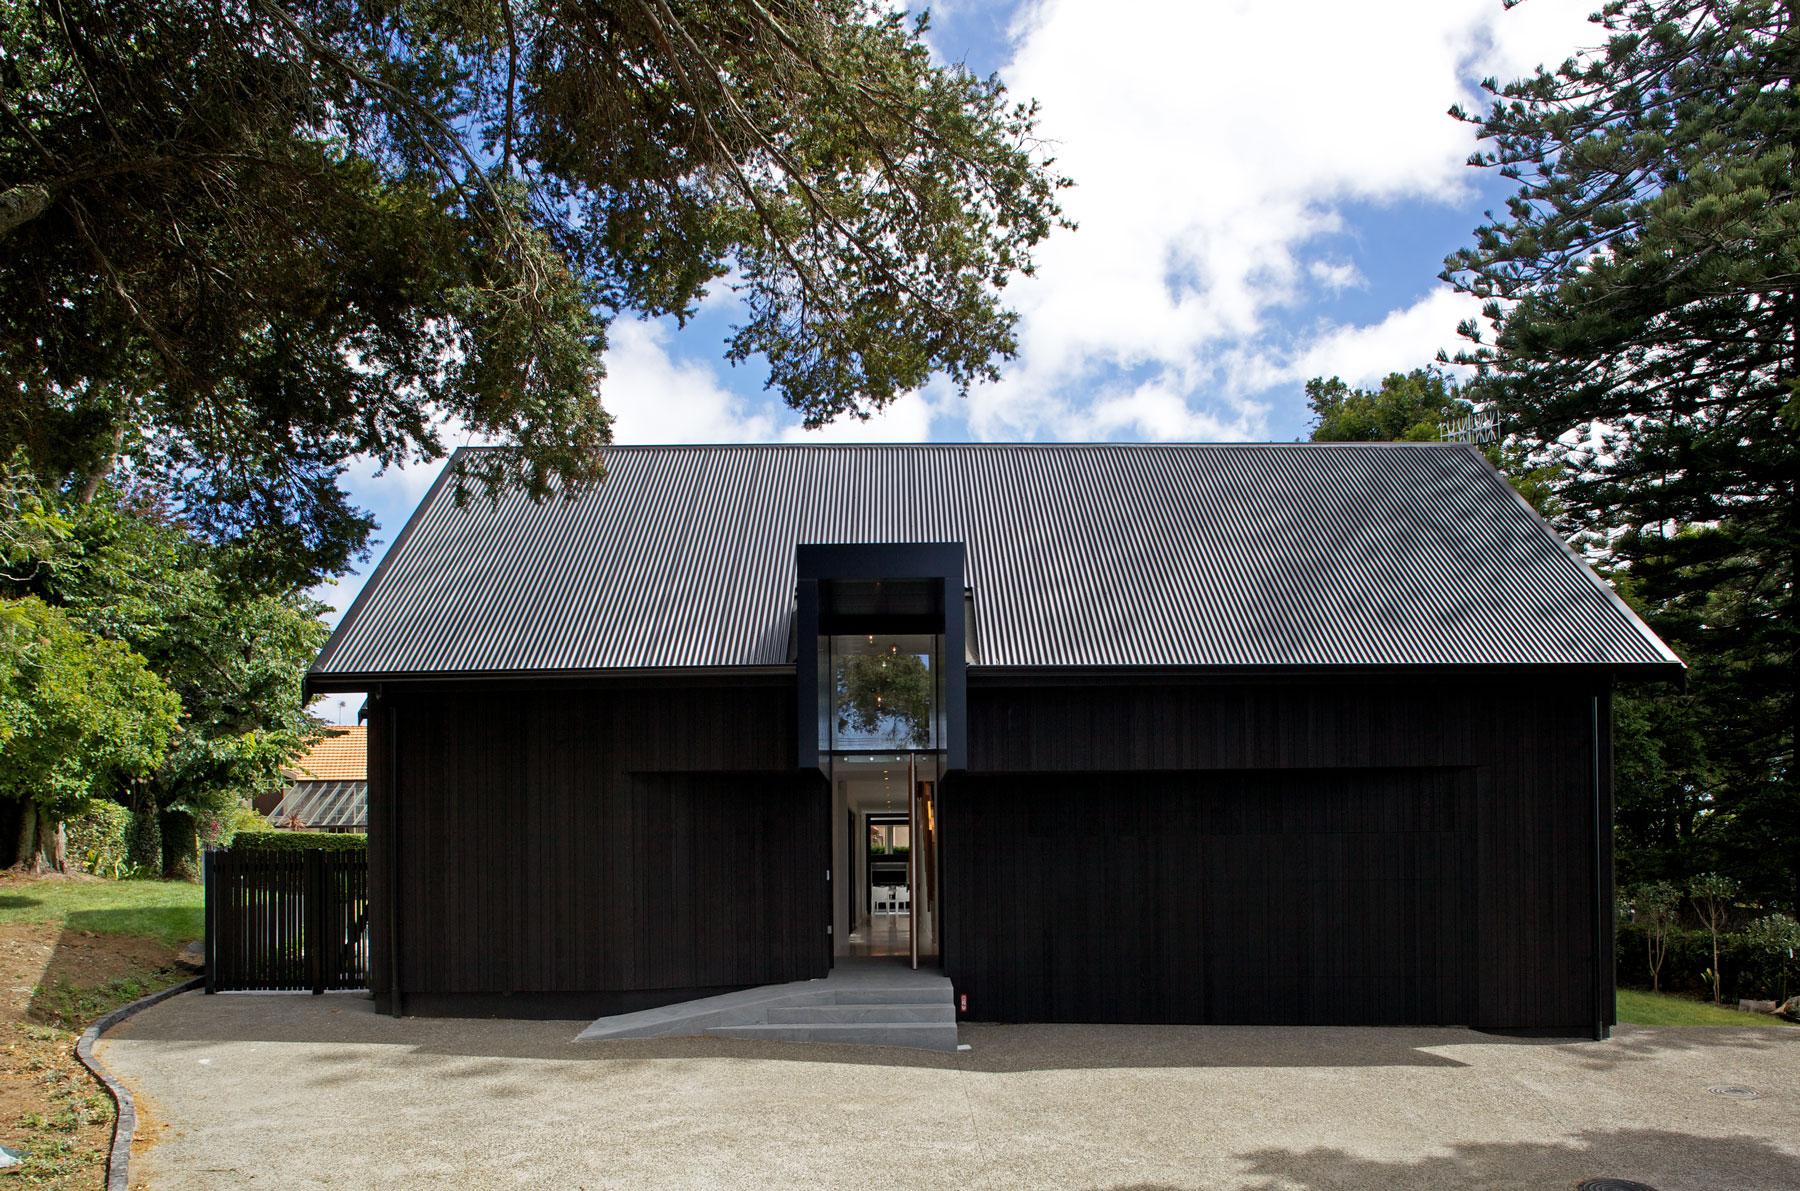 O Leuschke Kahn Architects_Trends-Owens-LKA-_MG_4863.jpg